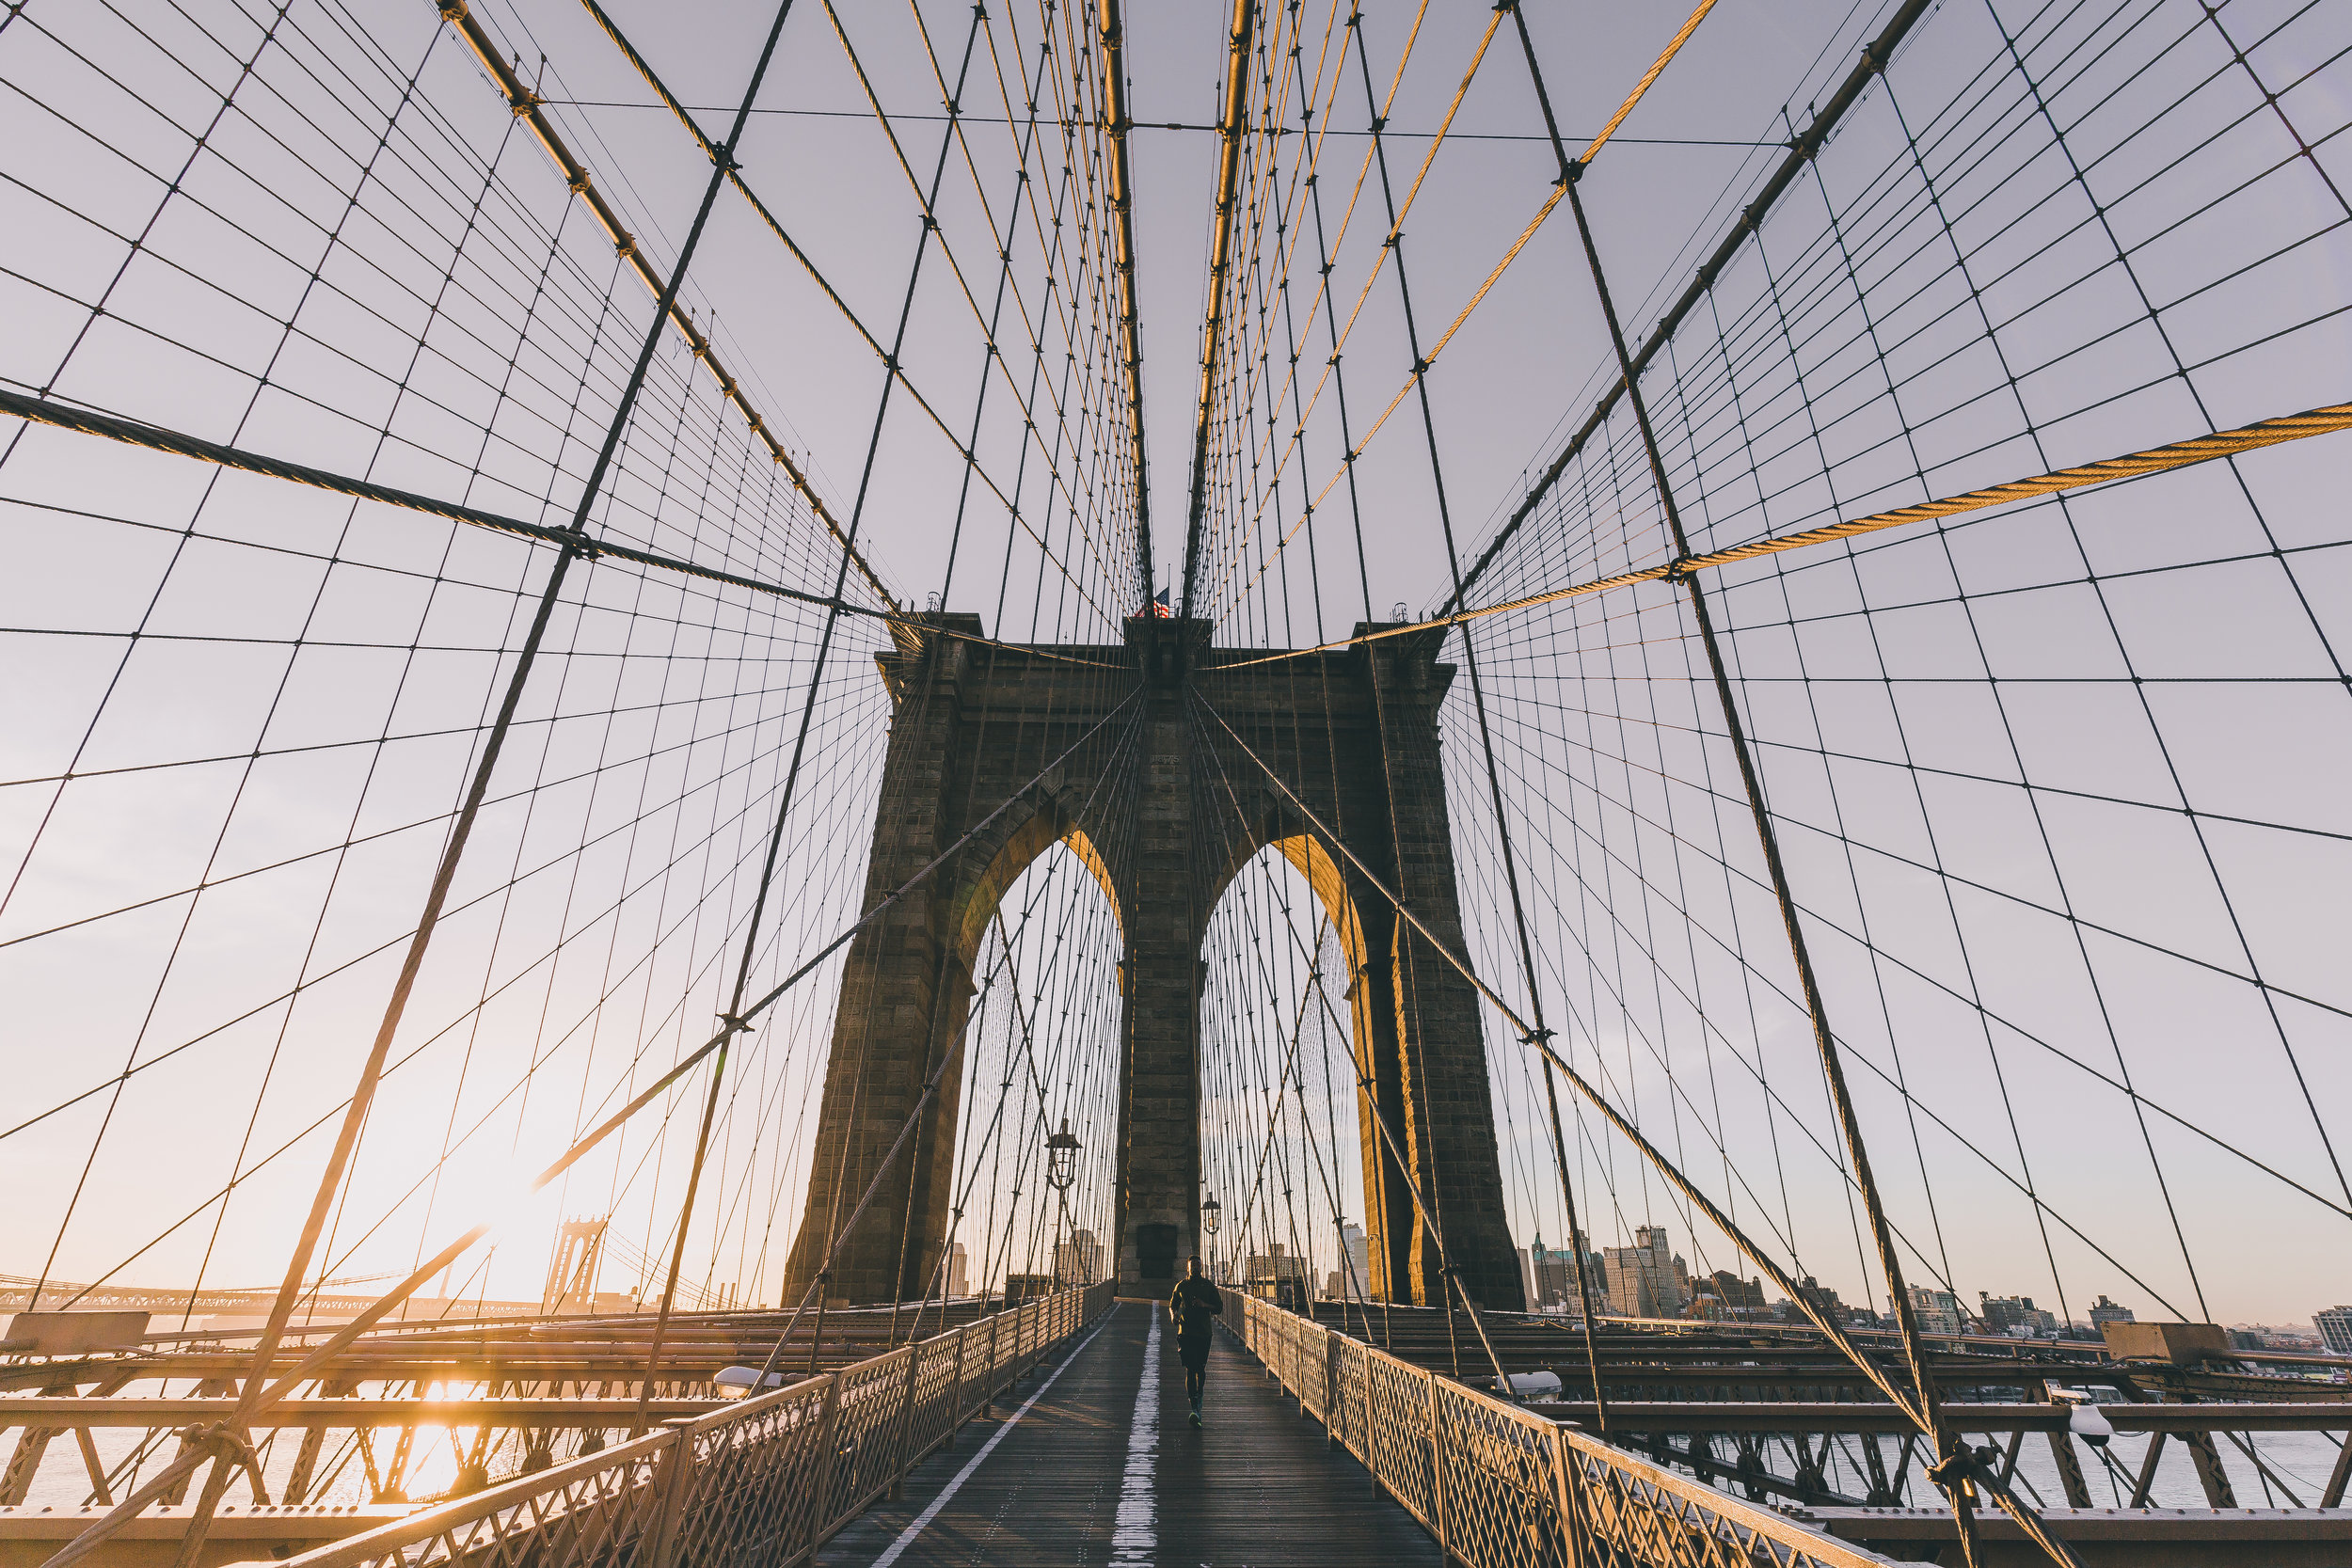 bridgesunrisefull.jpg